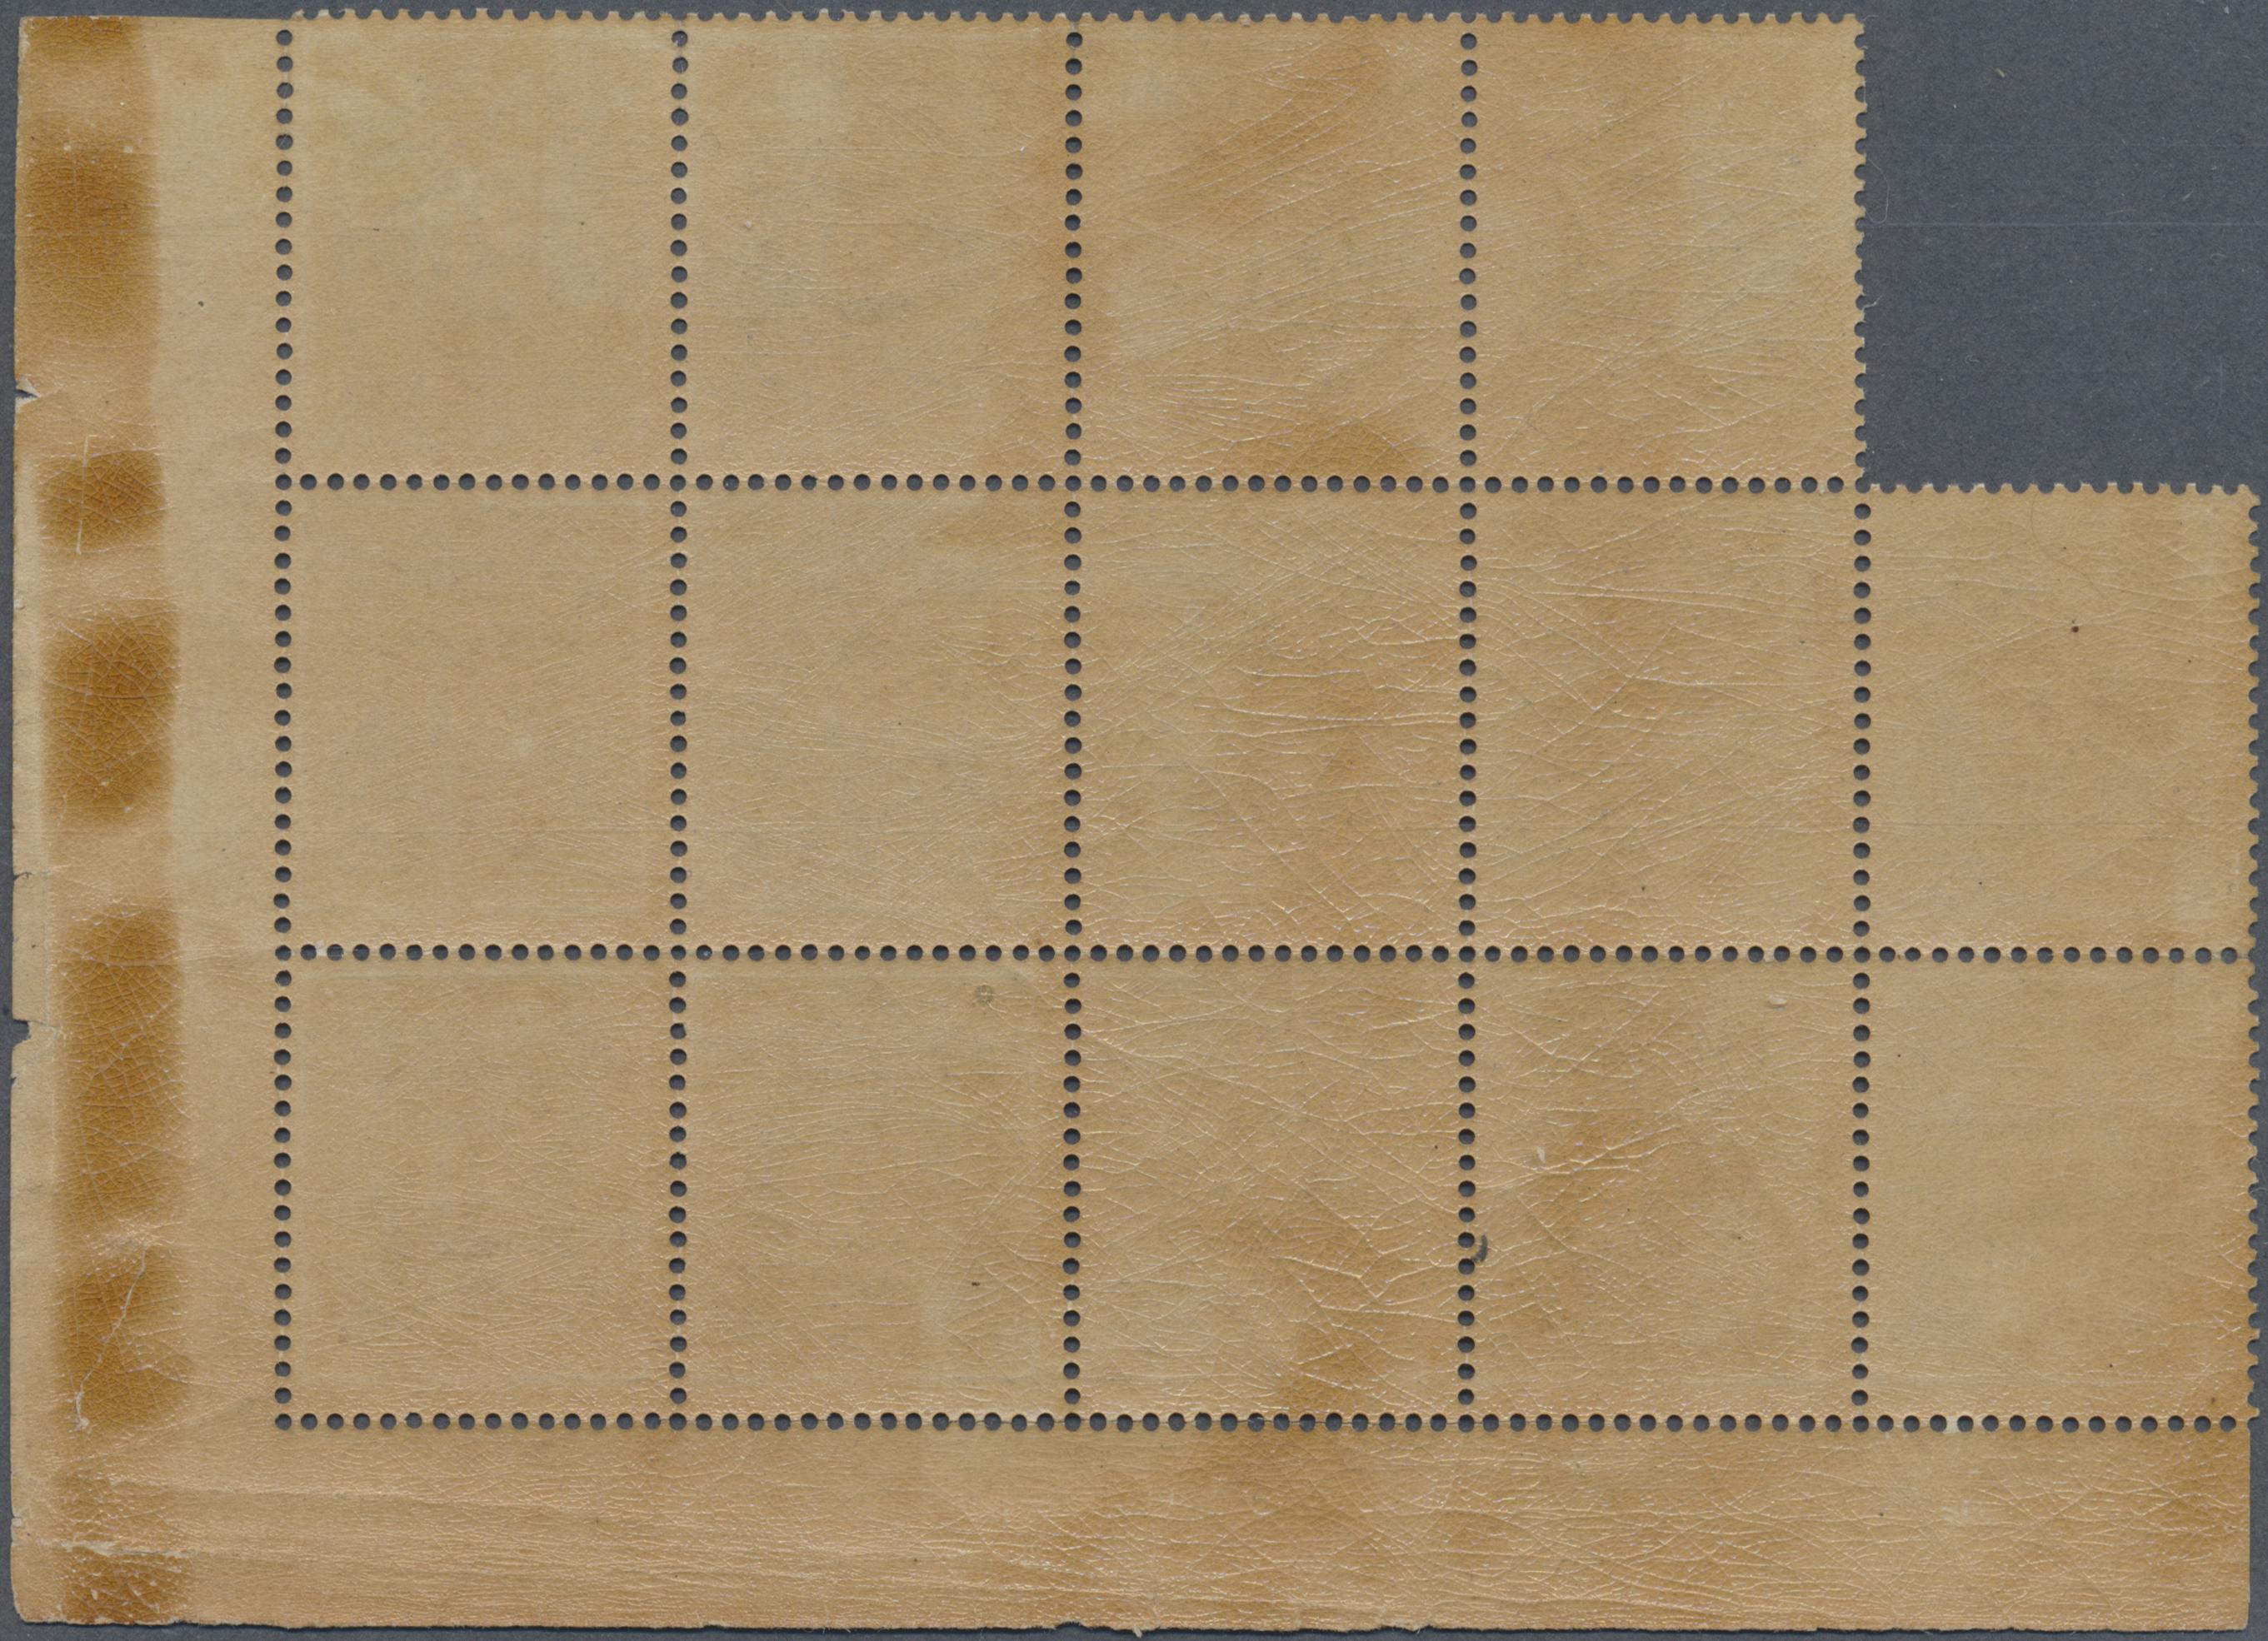 Lot 15653 - Belgien - Portomarken  -  Auktionshaus Christoph Gärtner GmbH & Co. KG Single lots Philately Overseas & Europe. Auction #39 Day 4